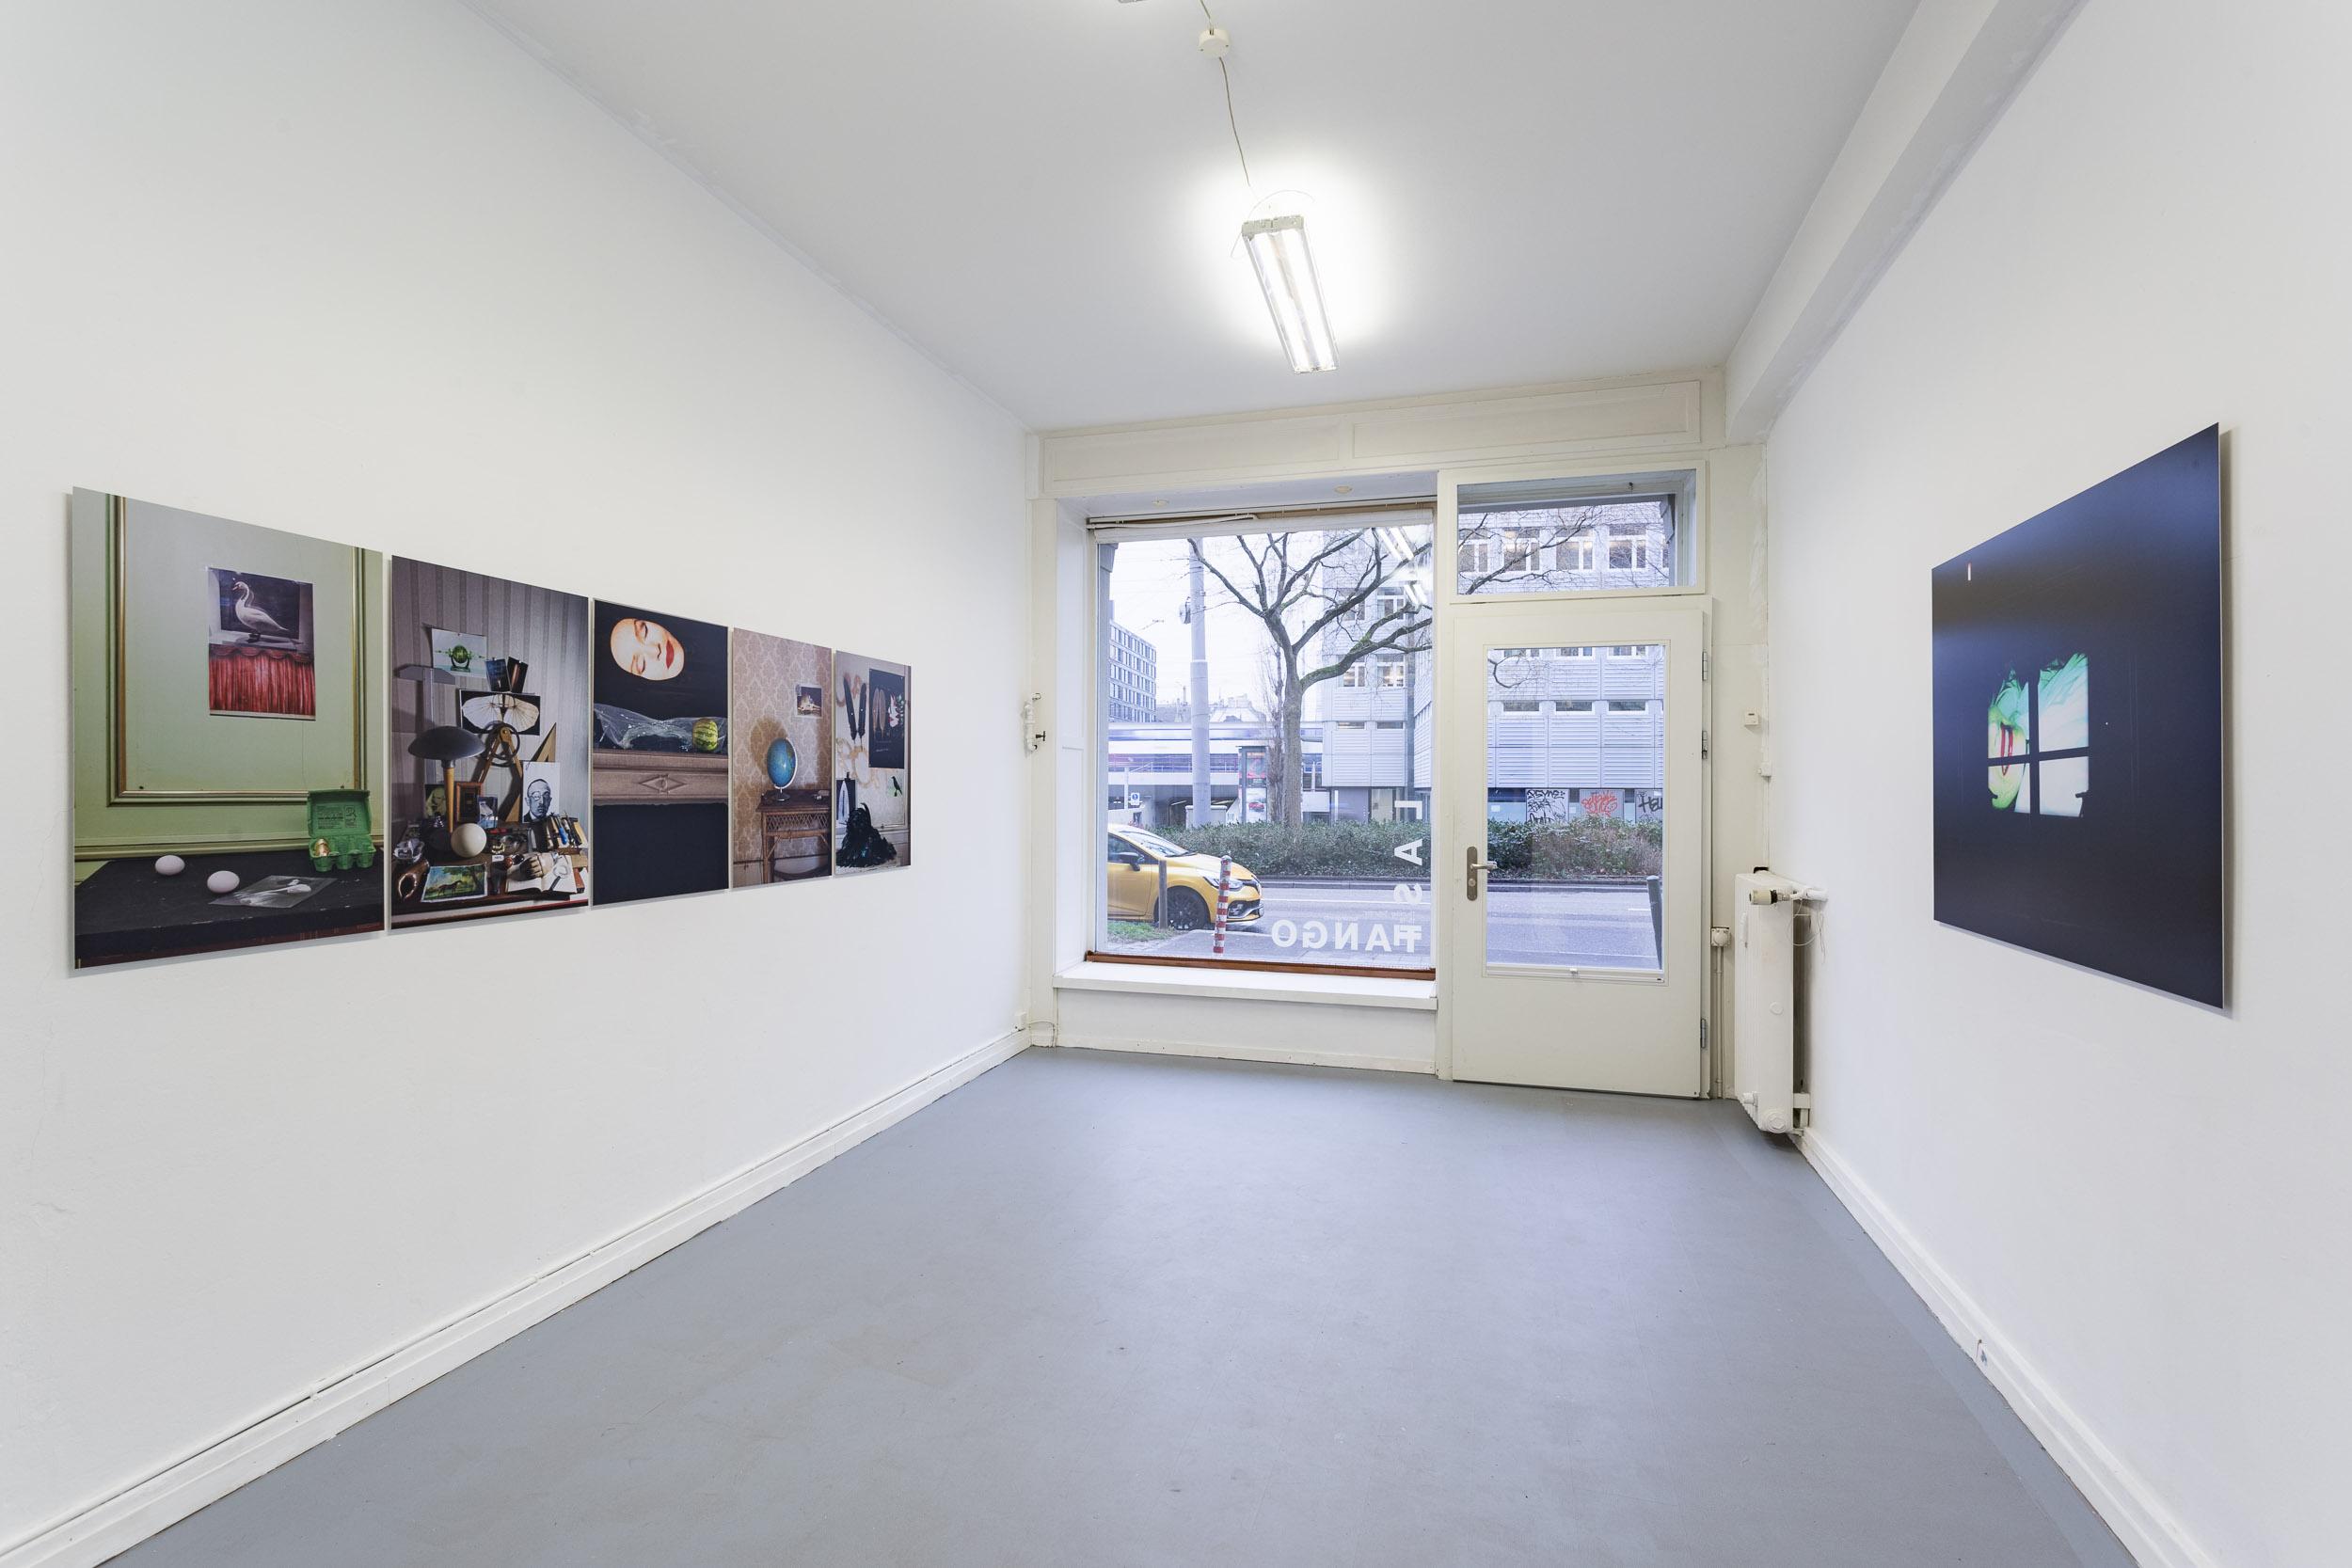 Left: Manon,  Stillleben , 2017, C-Prints on Fuji Crystal Paper mounted on Aluminium, 84 x 56 cm  Right: Manon,  Ohne Titel , 2017, C-Prints on Aluminium, 94 x 126cm  Photo: Kilian Bannwart